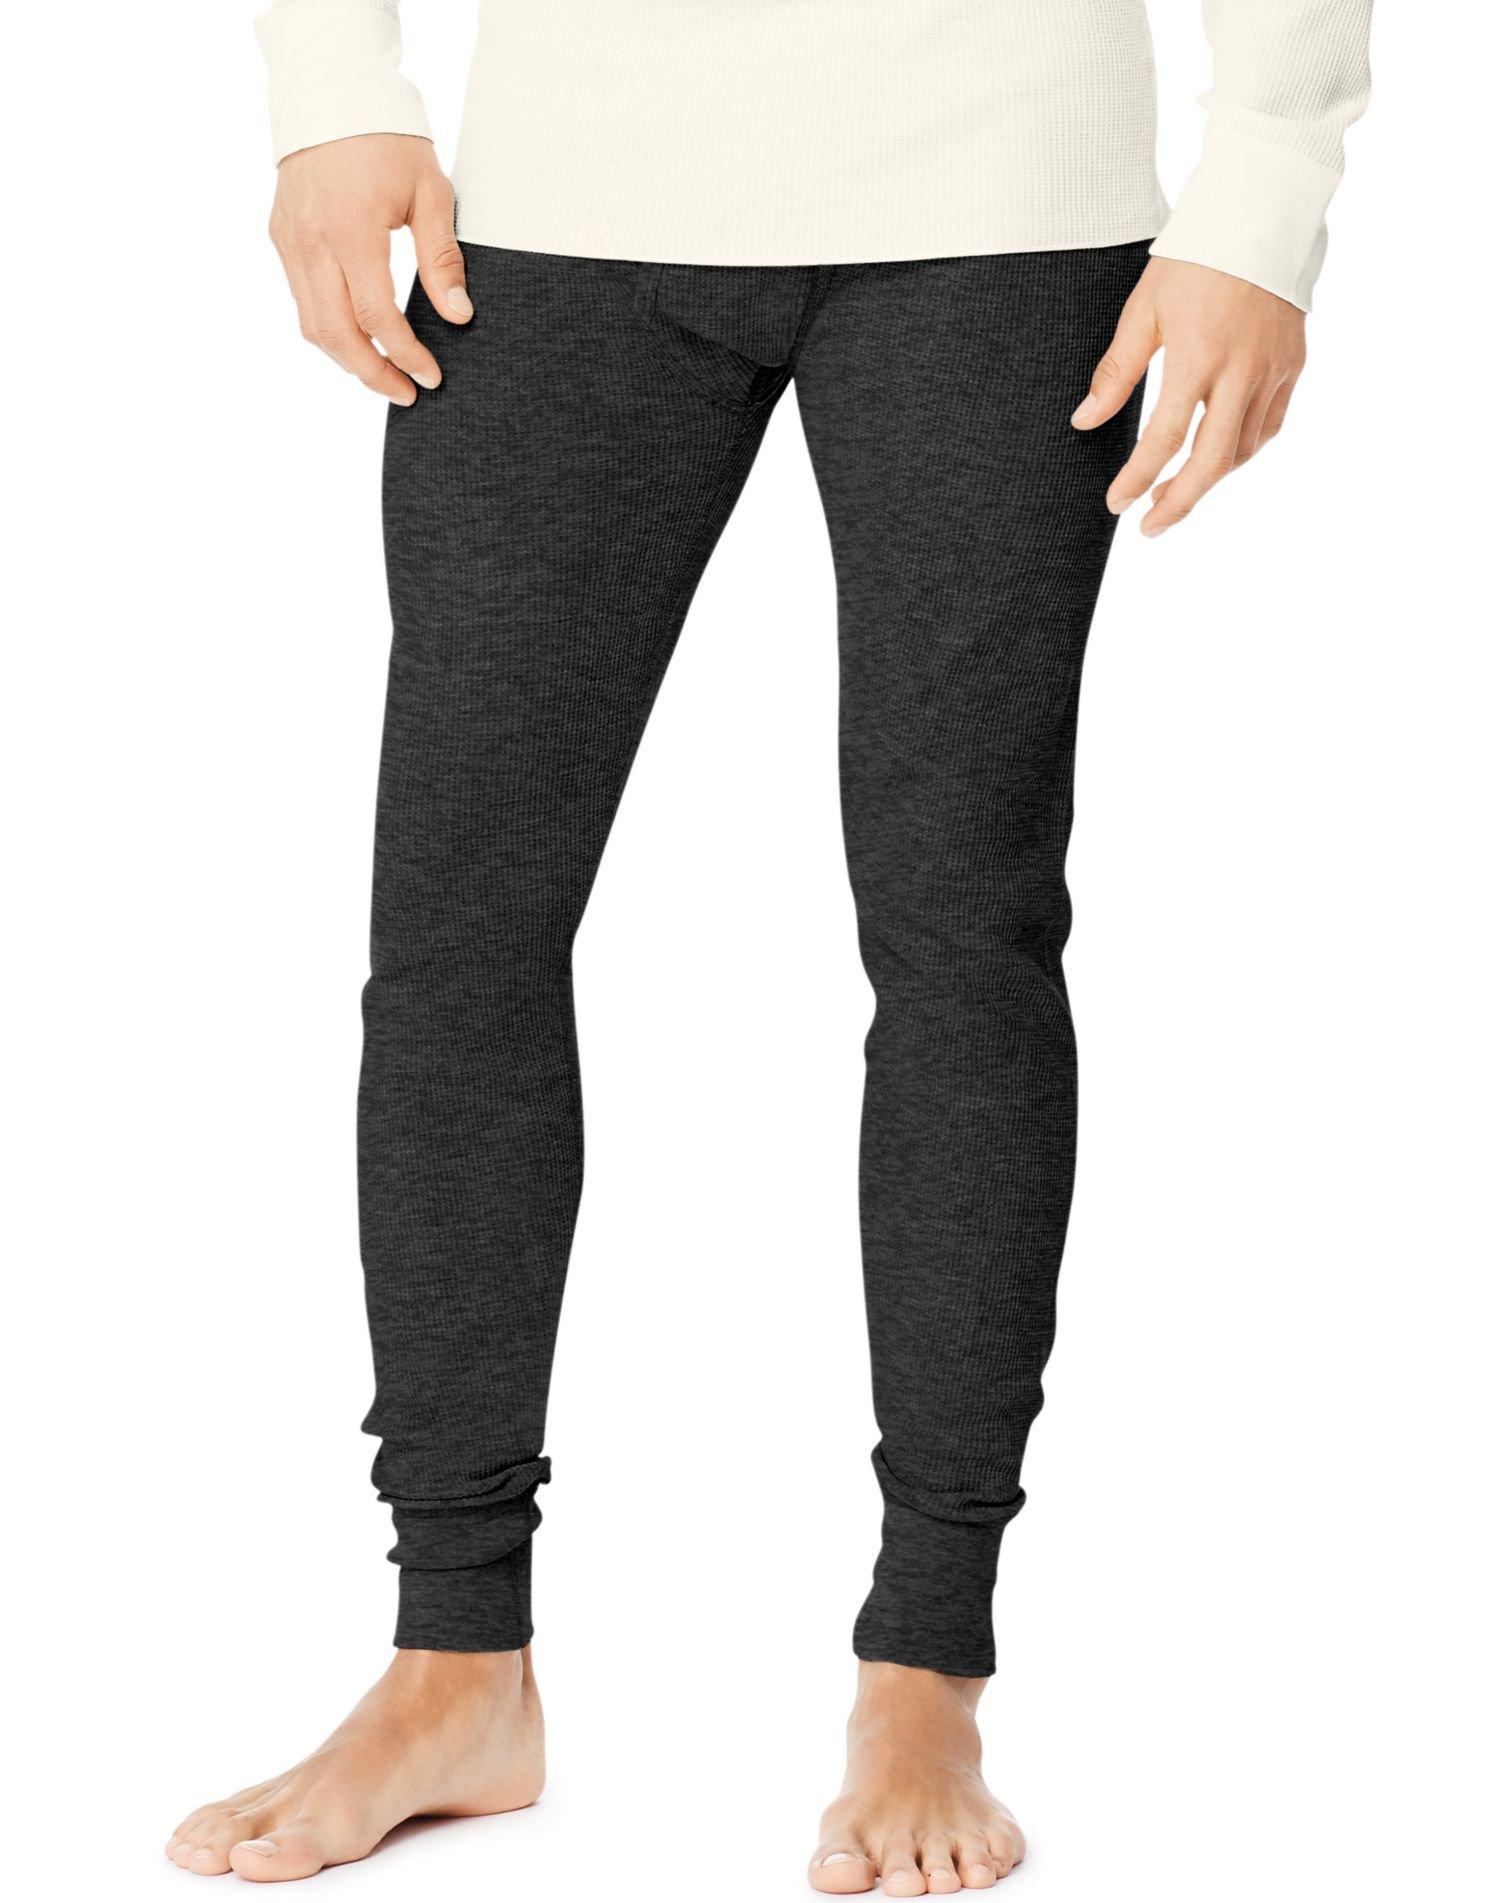 Hanes Men's Tall Size Thermal Pant Bottoms, Medium Tall, Black